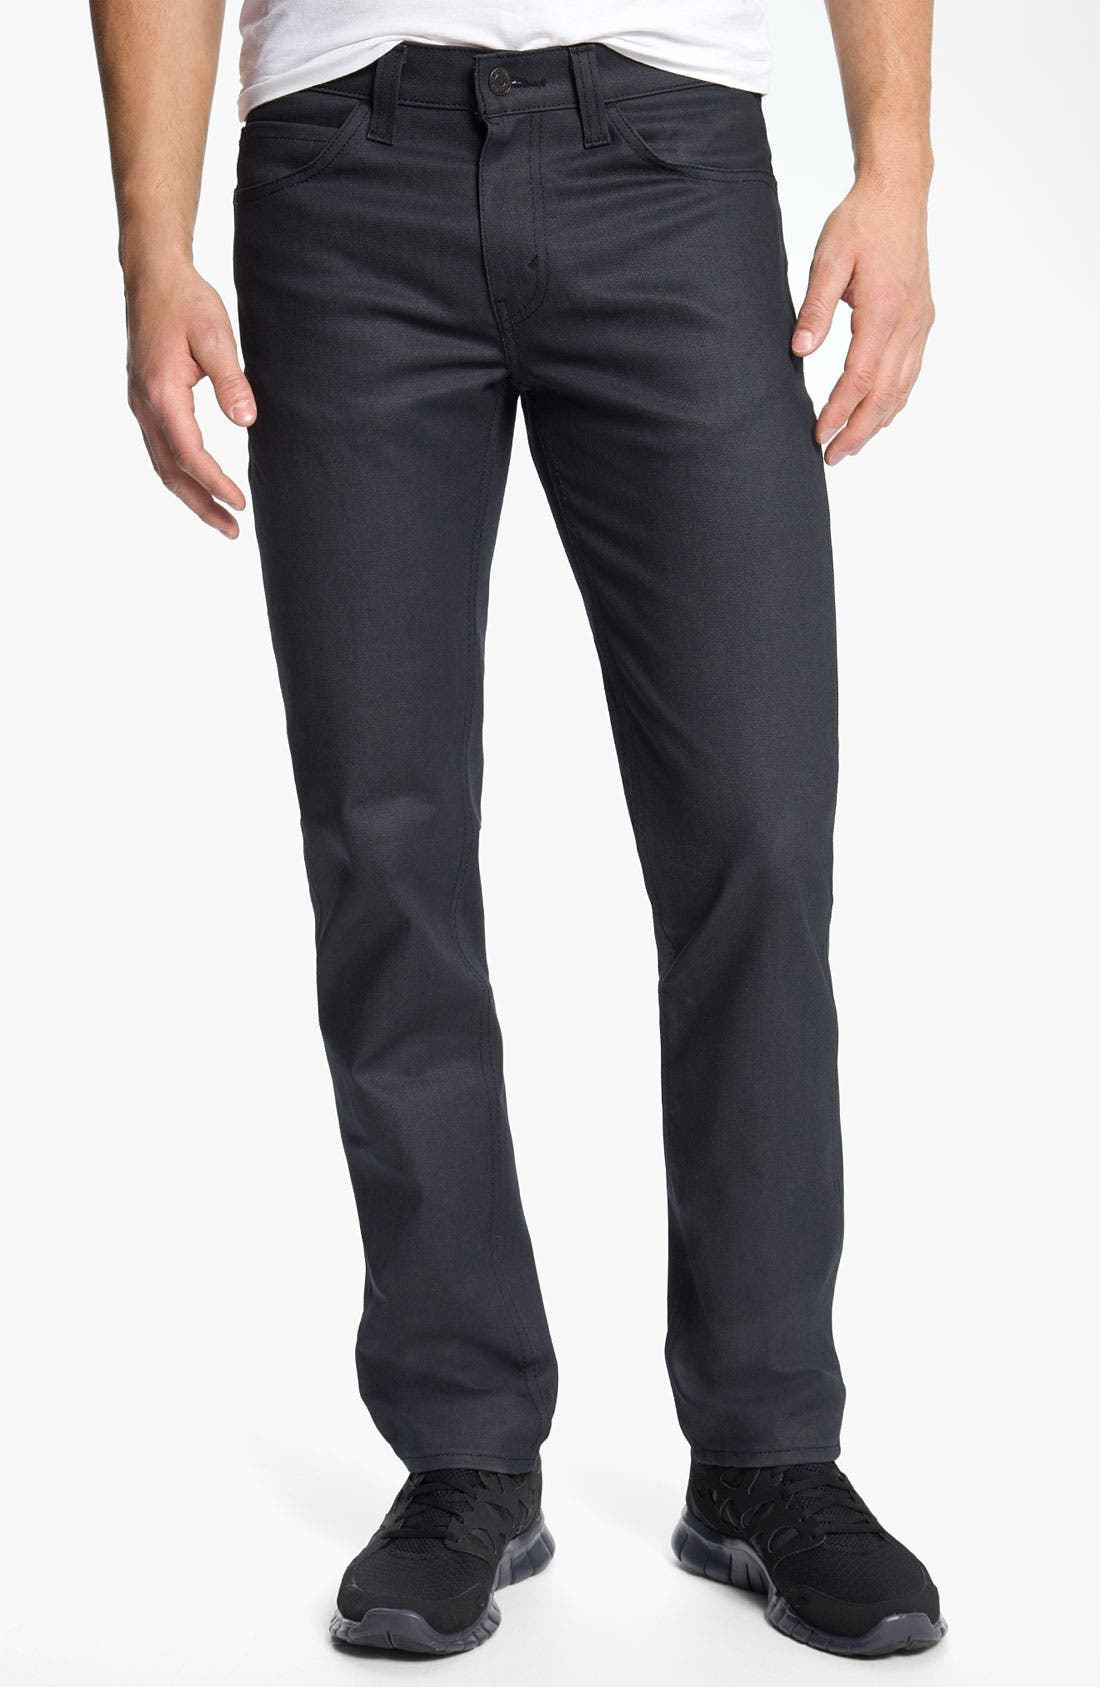 Alternate Image 2  - Levi's® '511' Slim Fit Jeans (Anthracite)